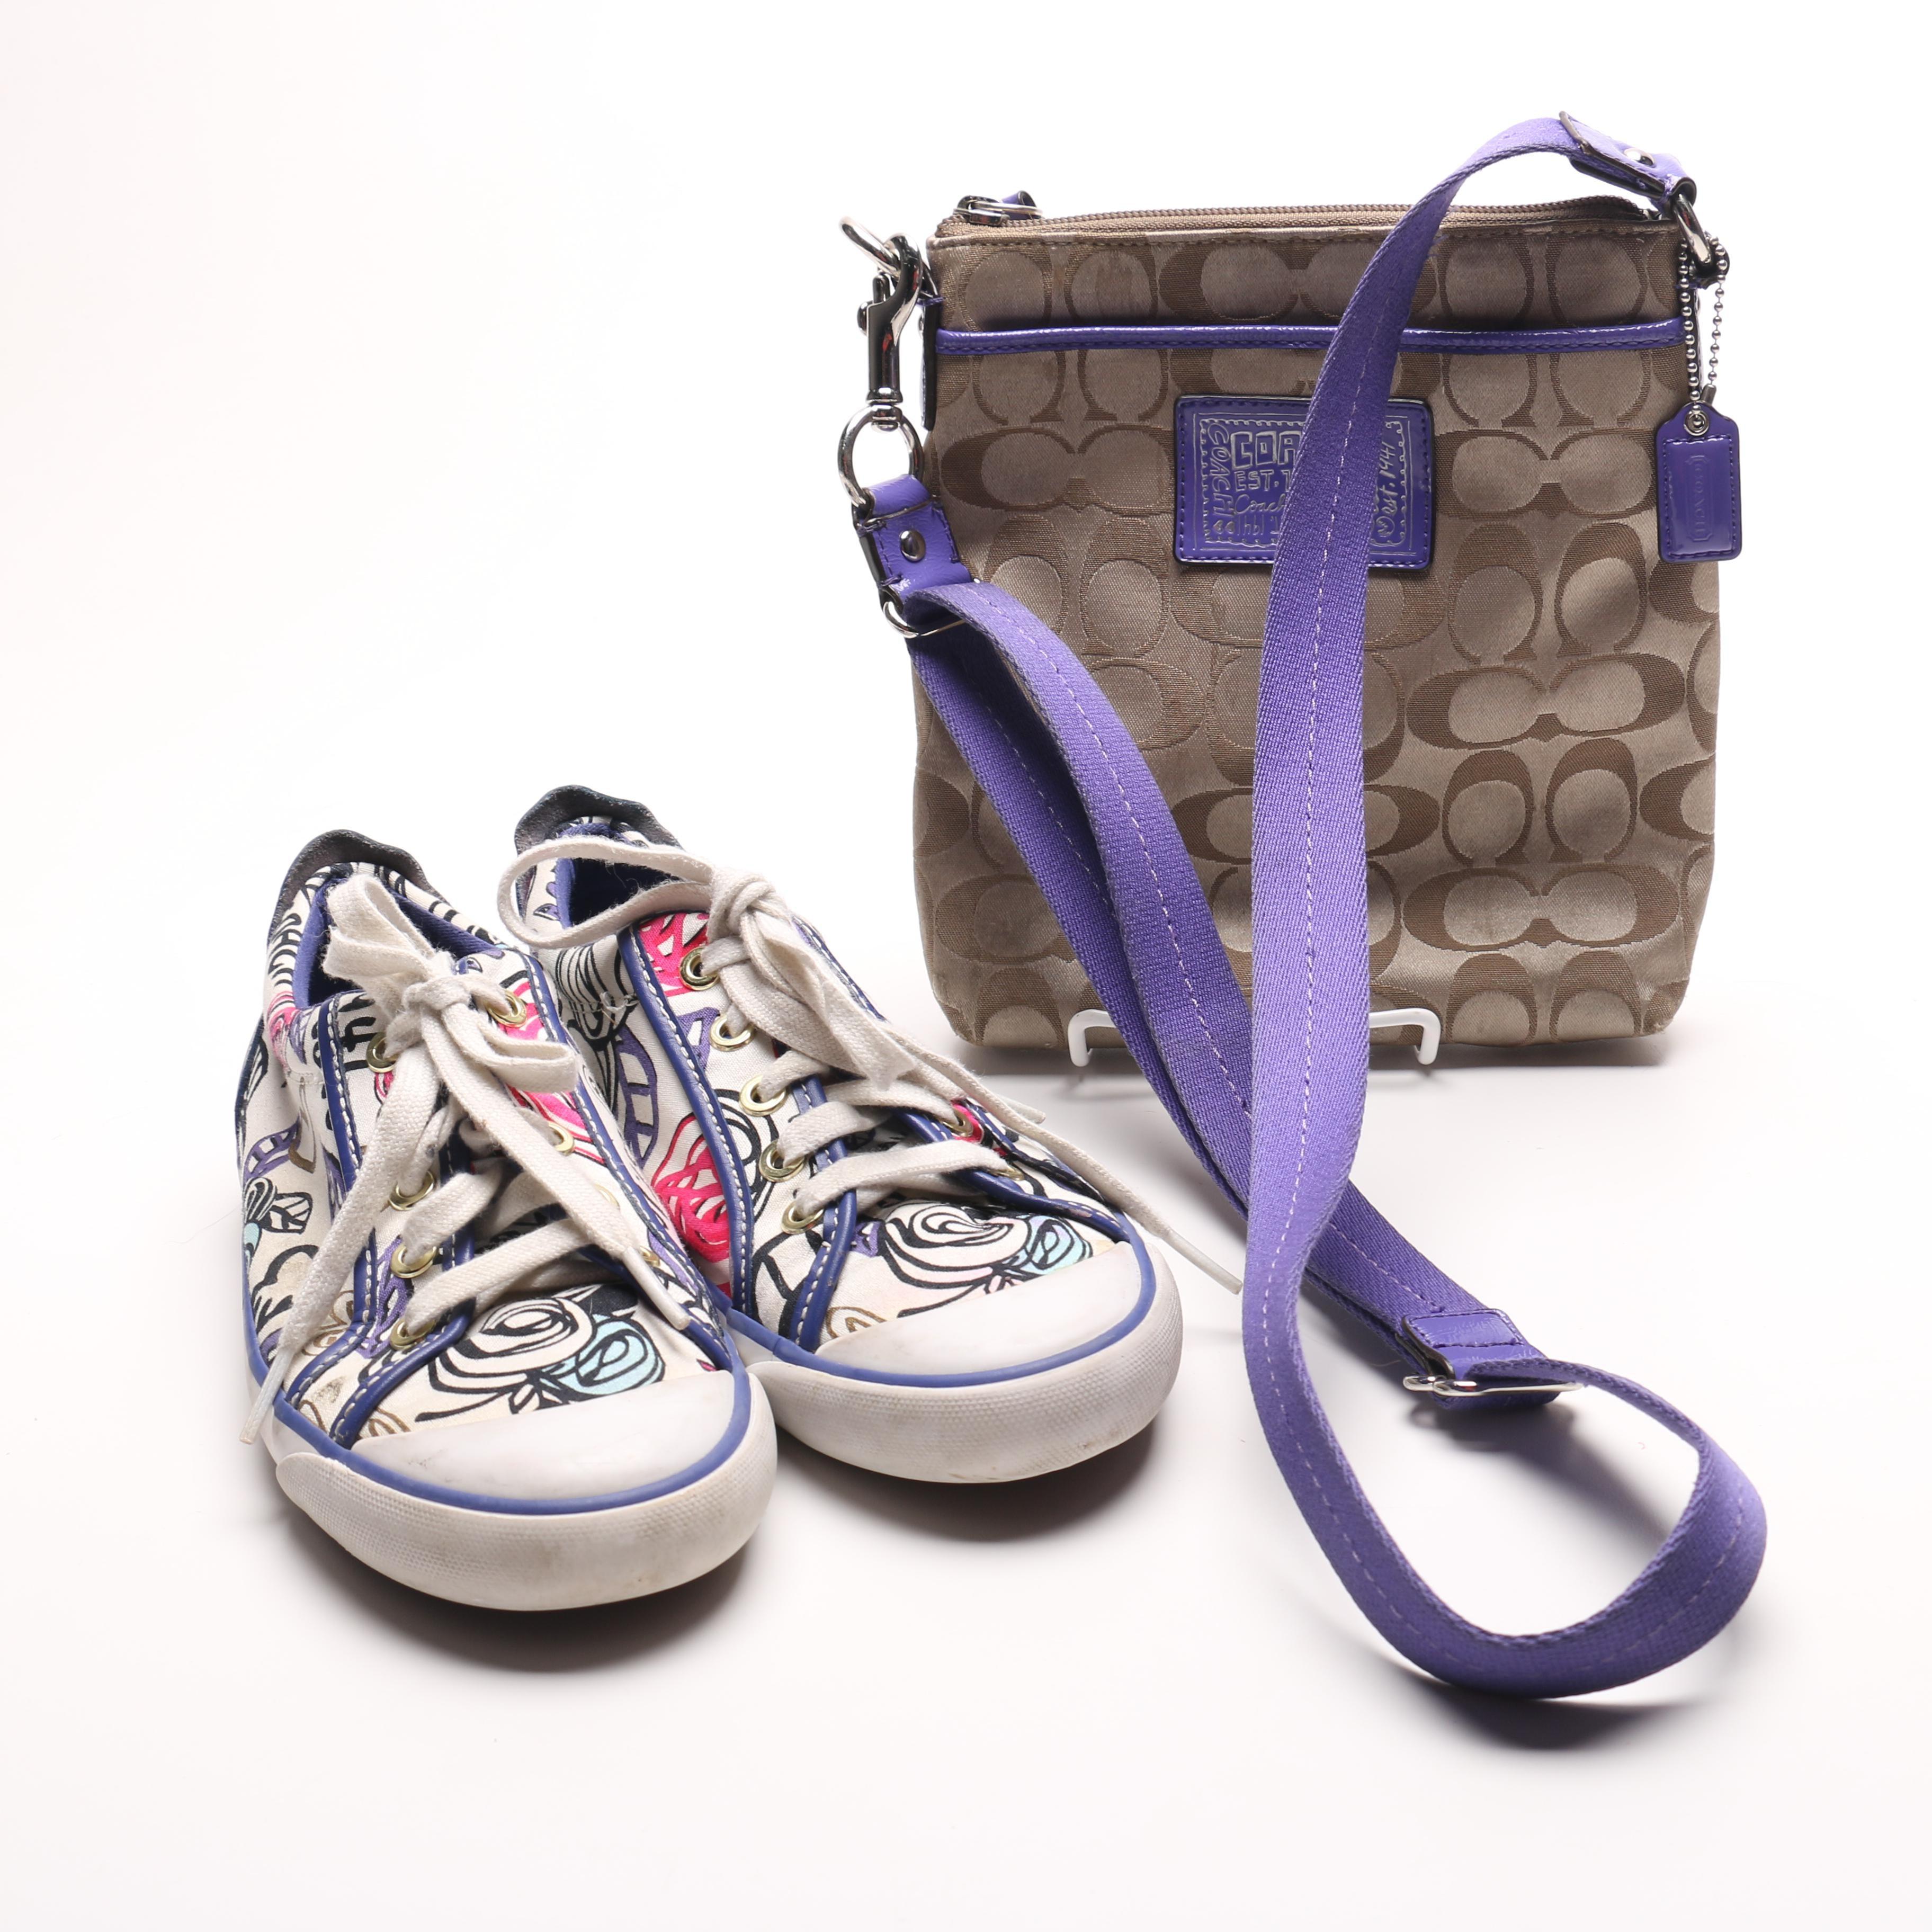 Coach Barrett Sneakers and Cross Body Sling Bag